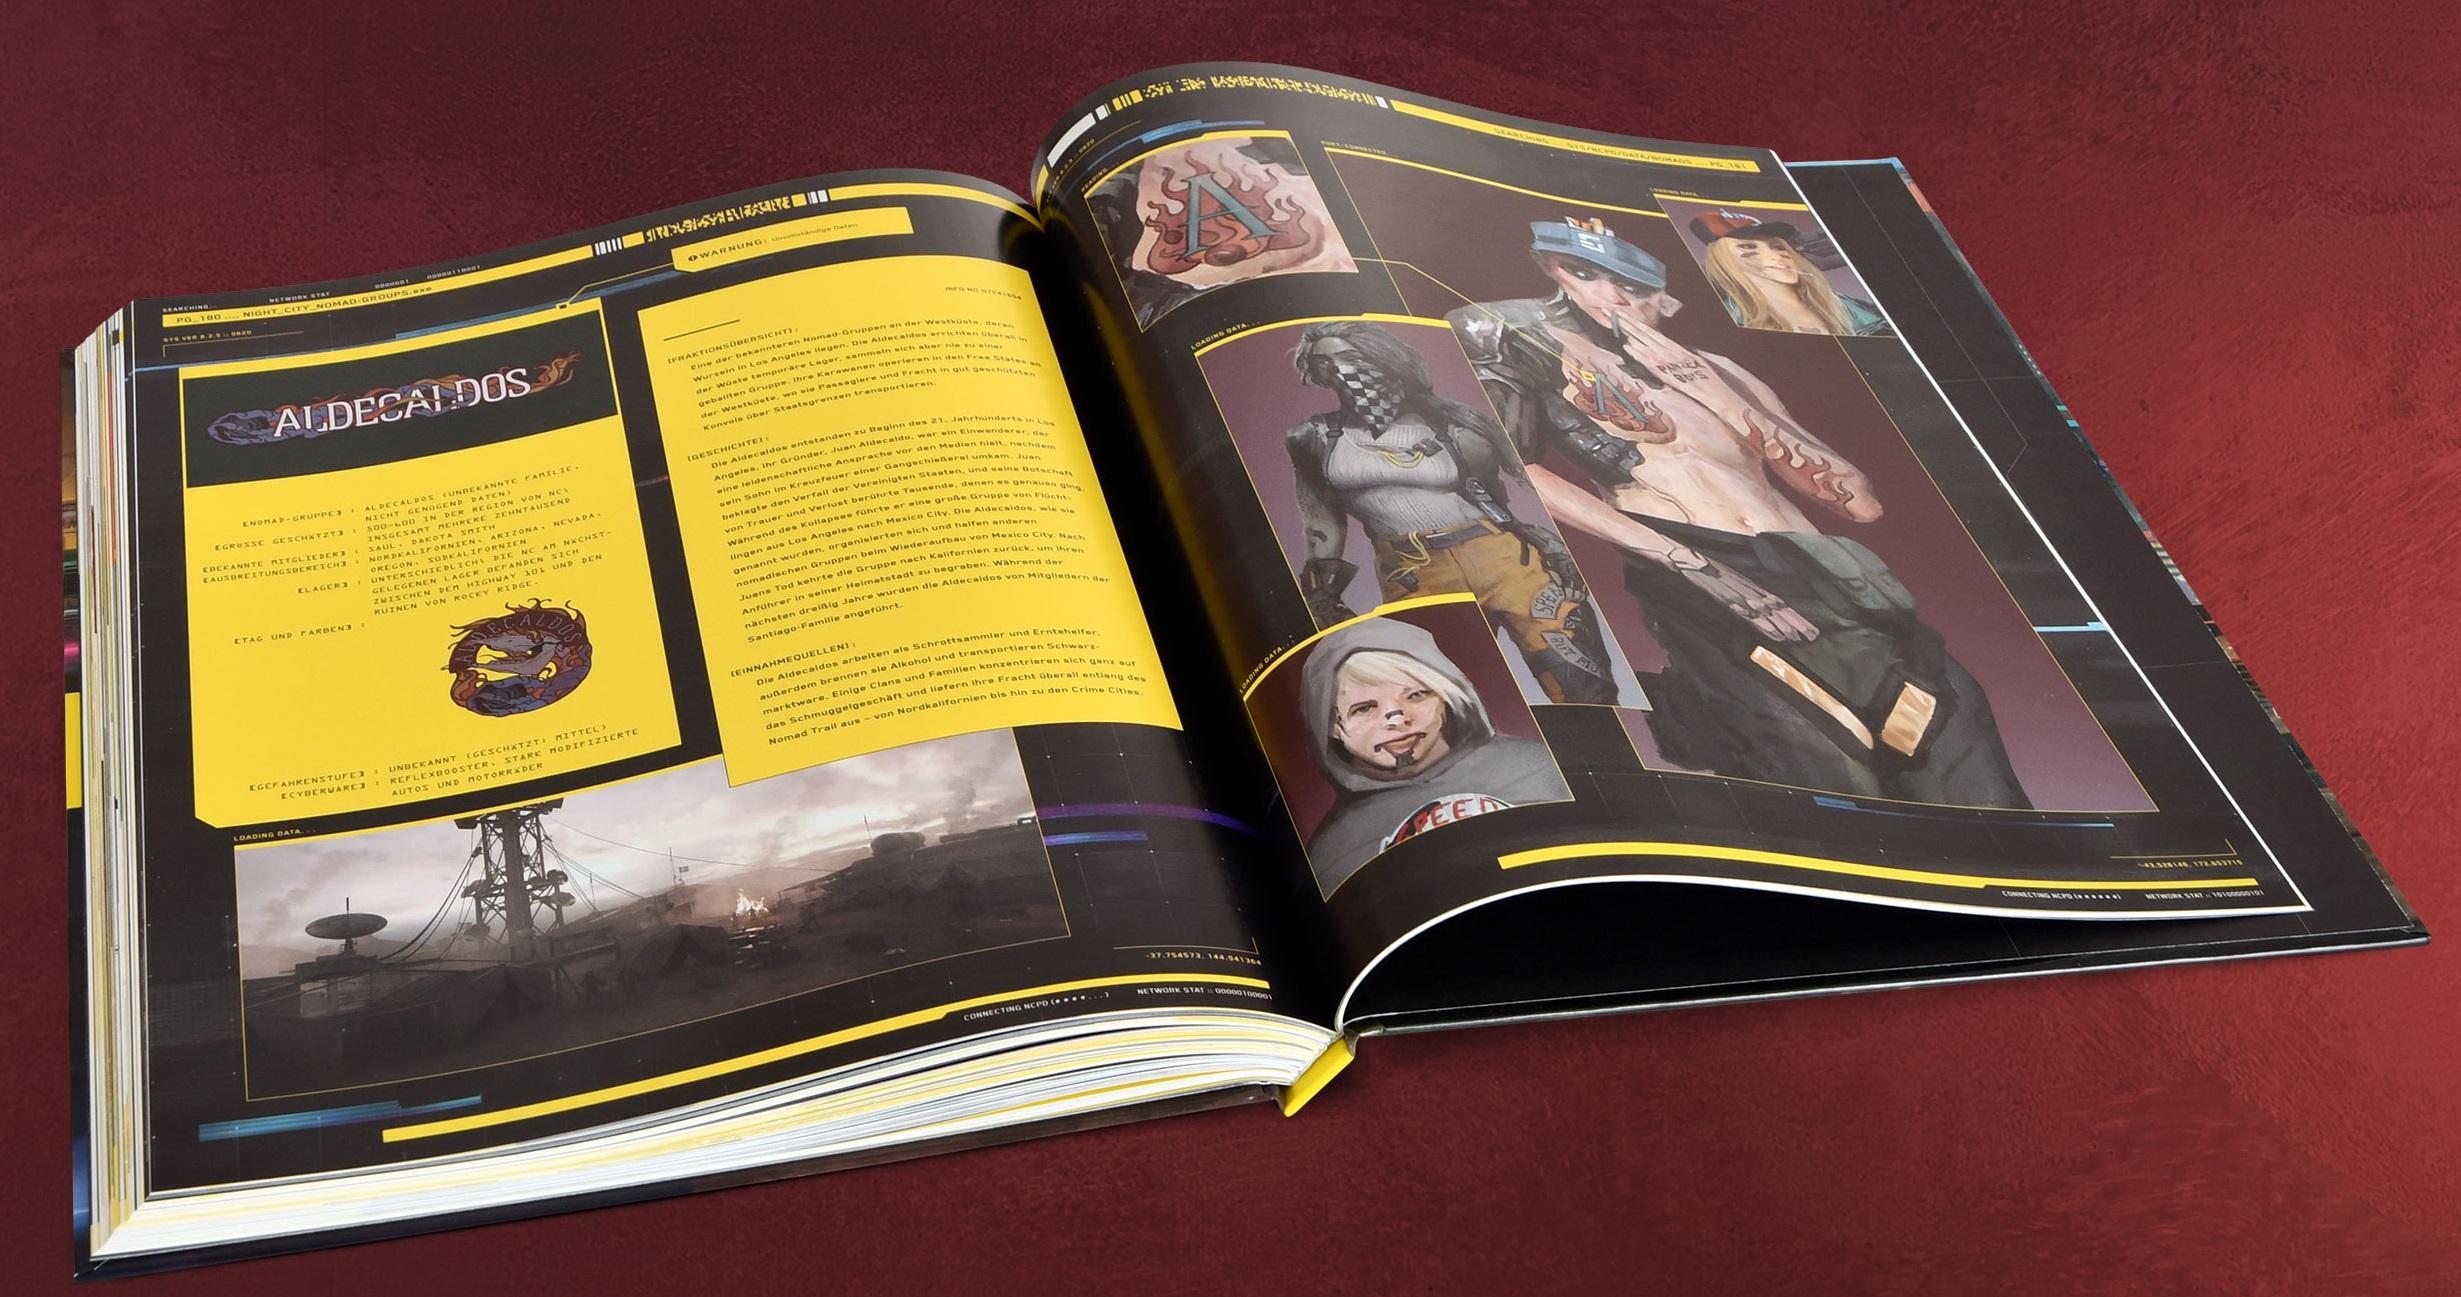 Cyberpunk 2077 Book Image 3